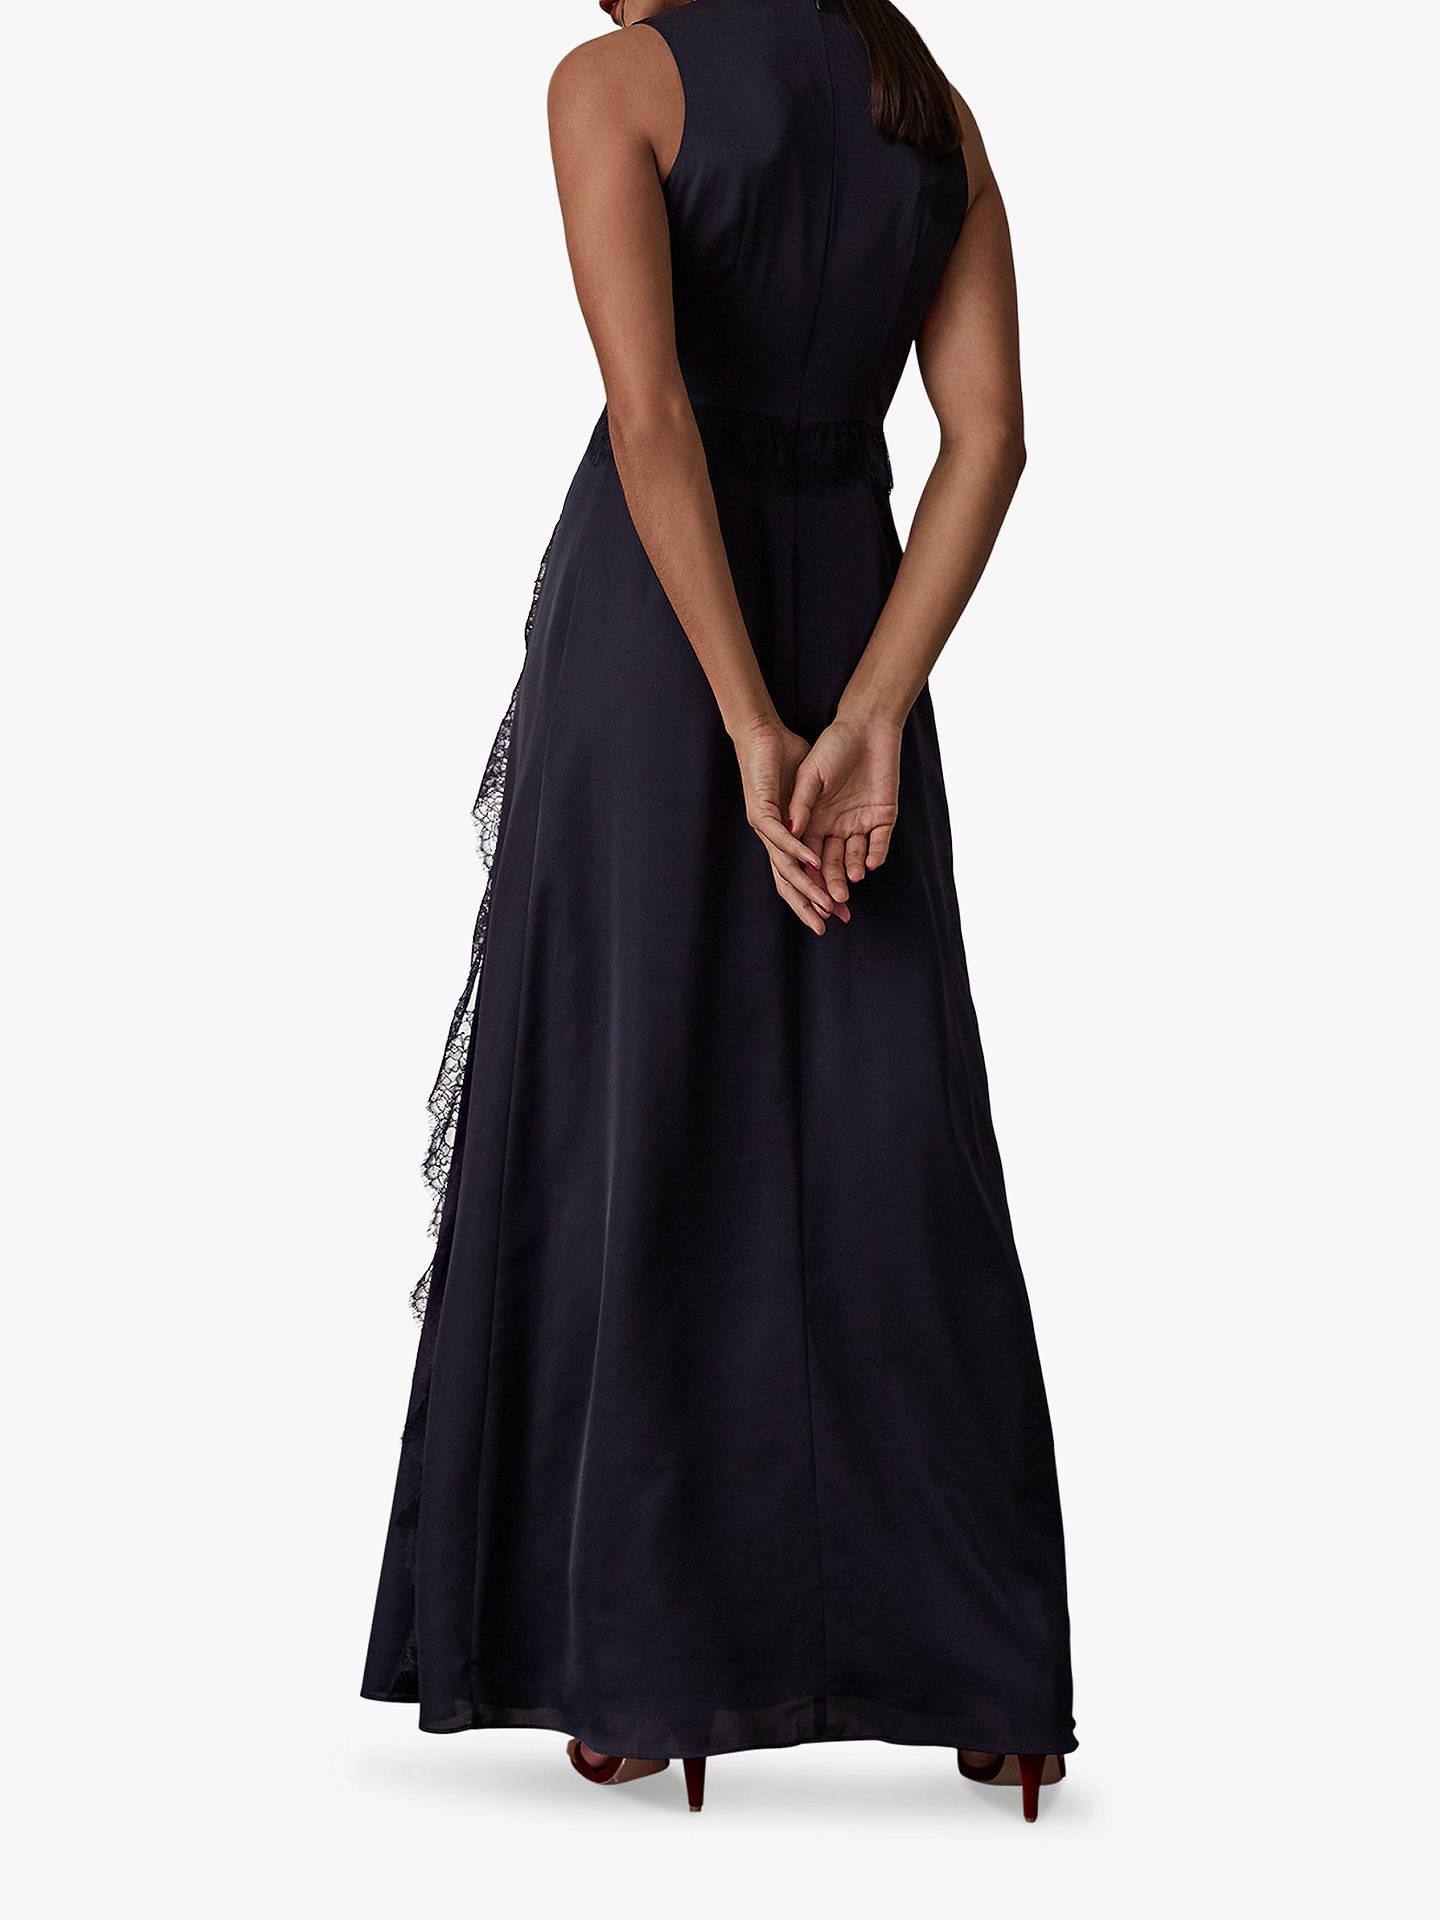 ee52becfb83 ... Buy Reiss Odette Lace Trim Maxi Dress, Navy, 6 Online at johnlewis.com  ...